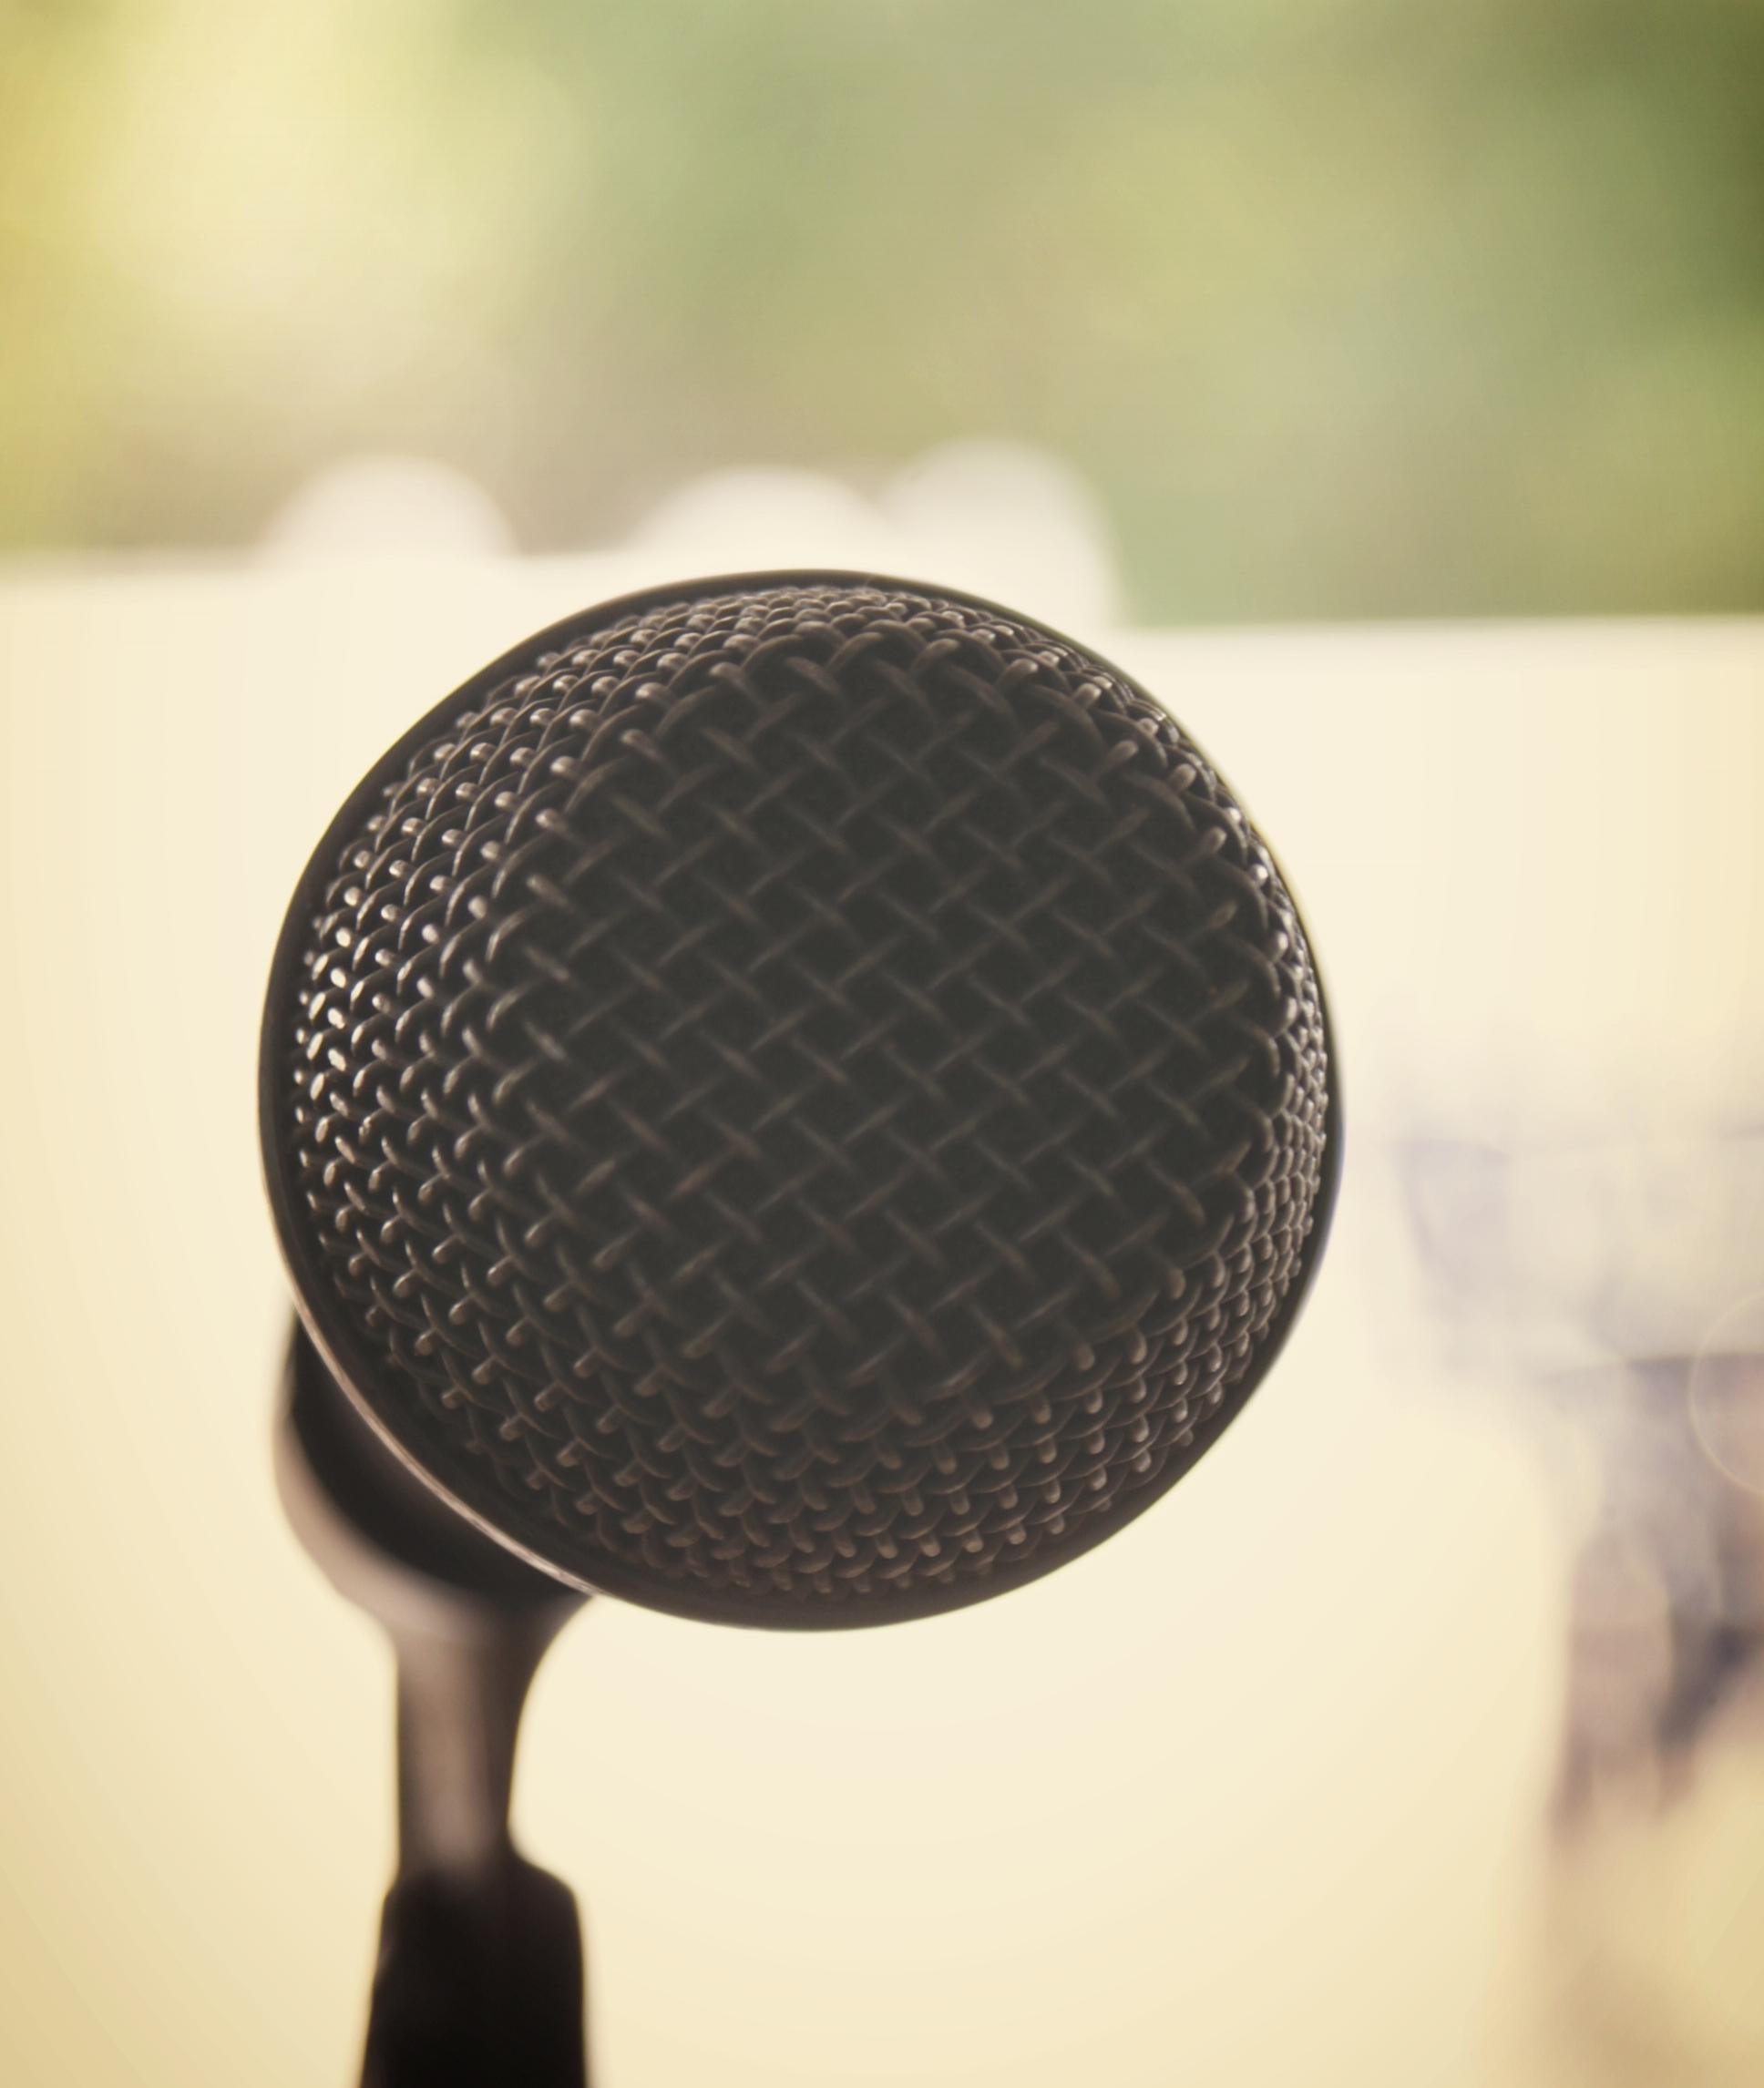 25491_Microphone.jpg